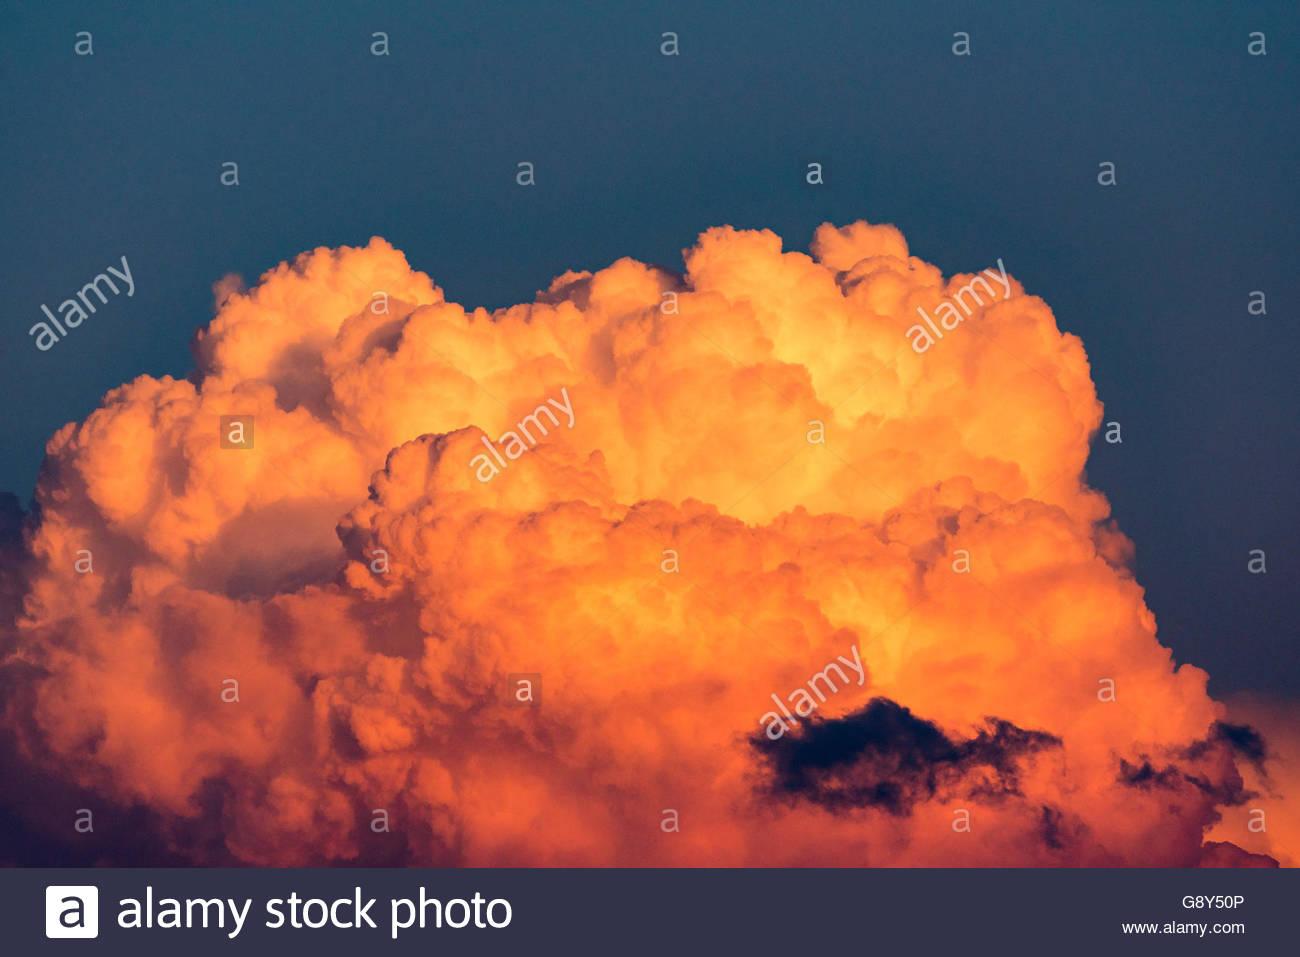 Colorful orange cloud cumulonimbus during sunset or dusk. - Stock Image